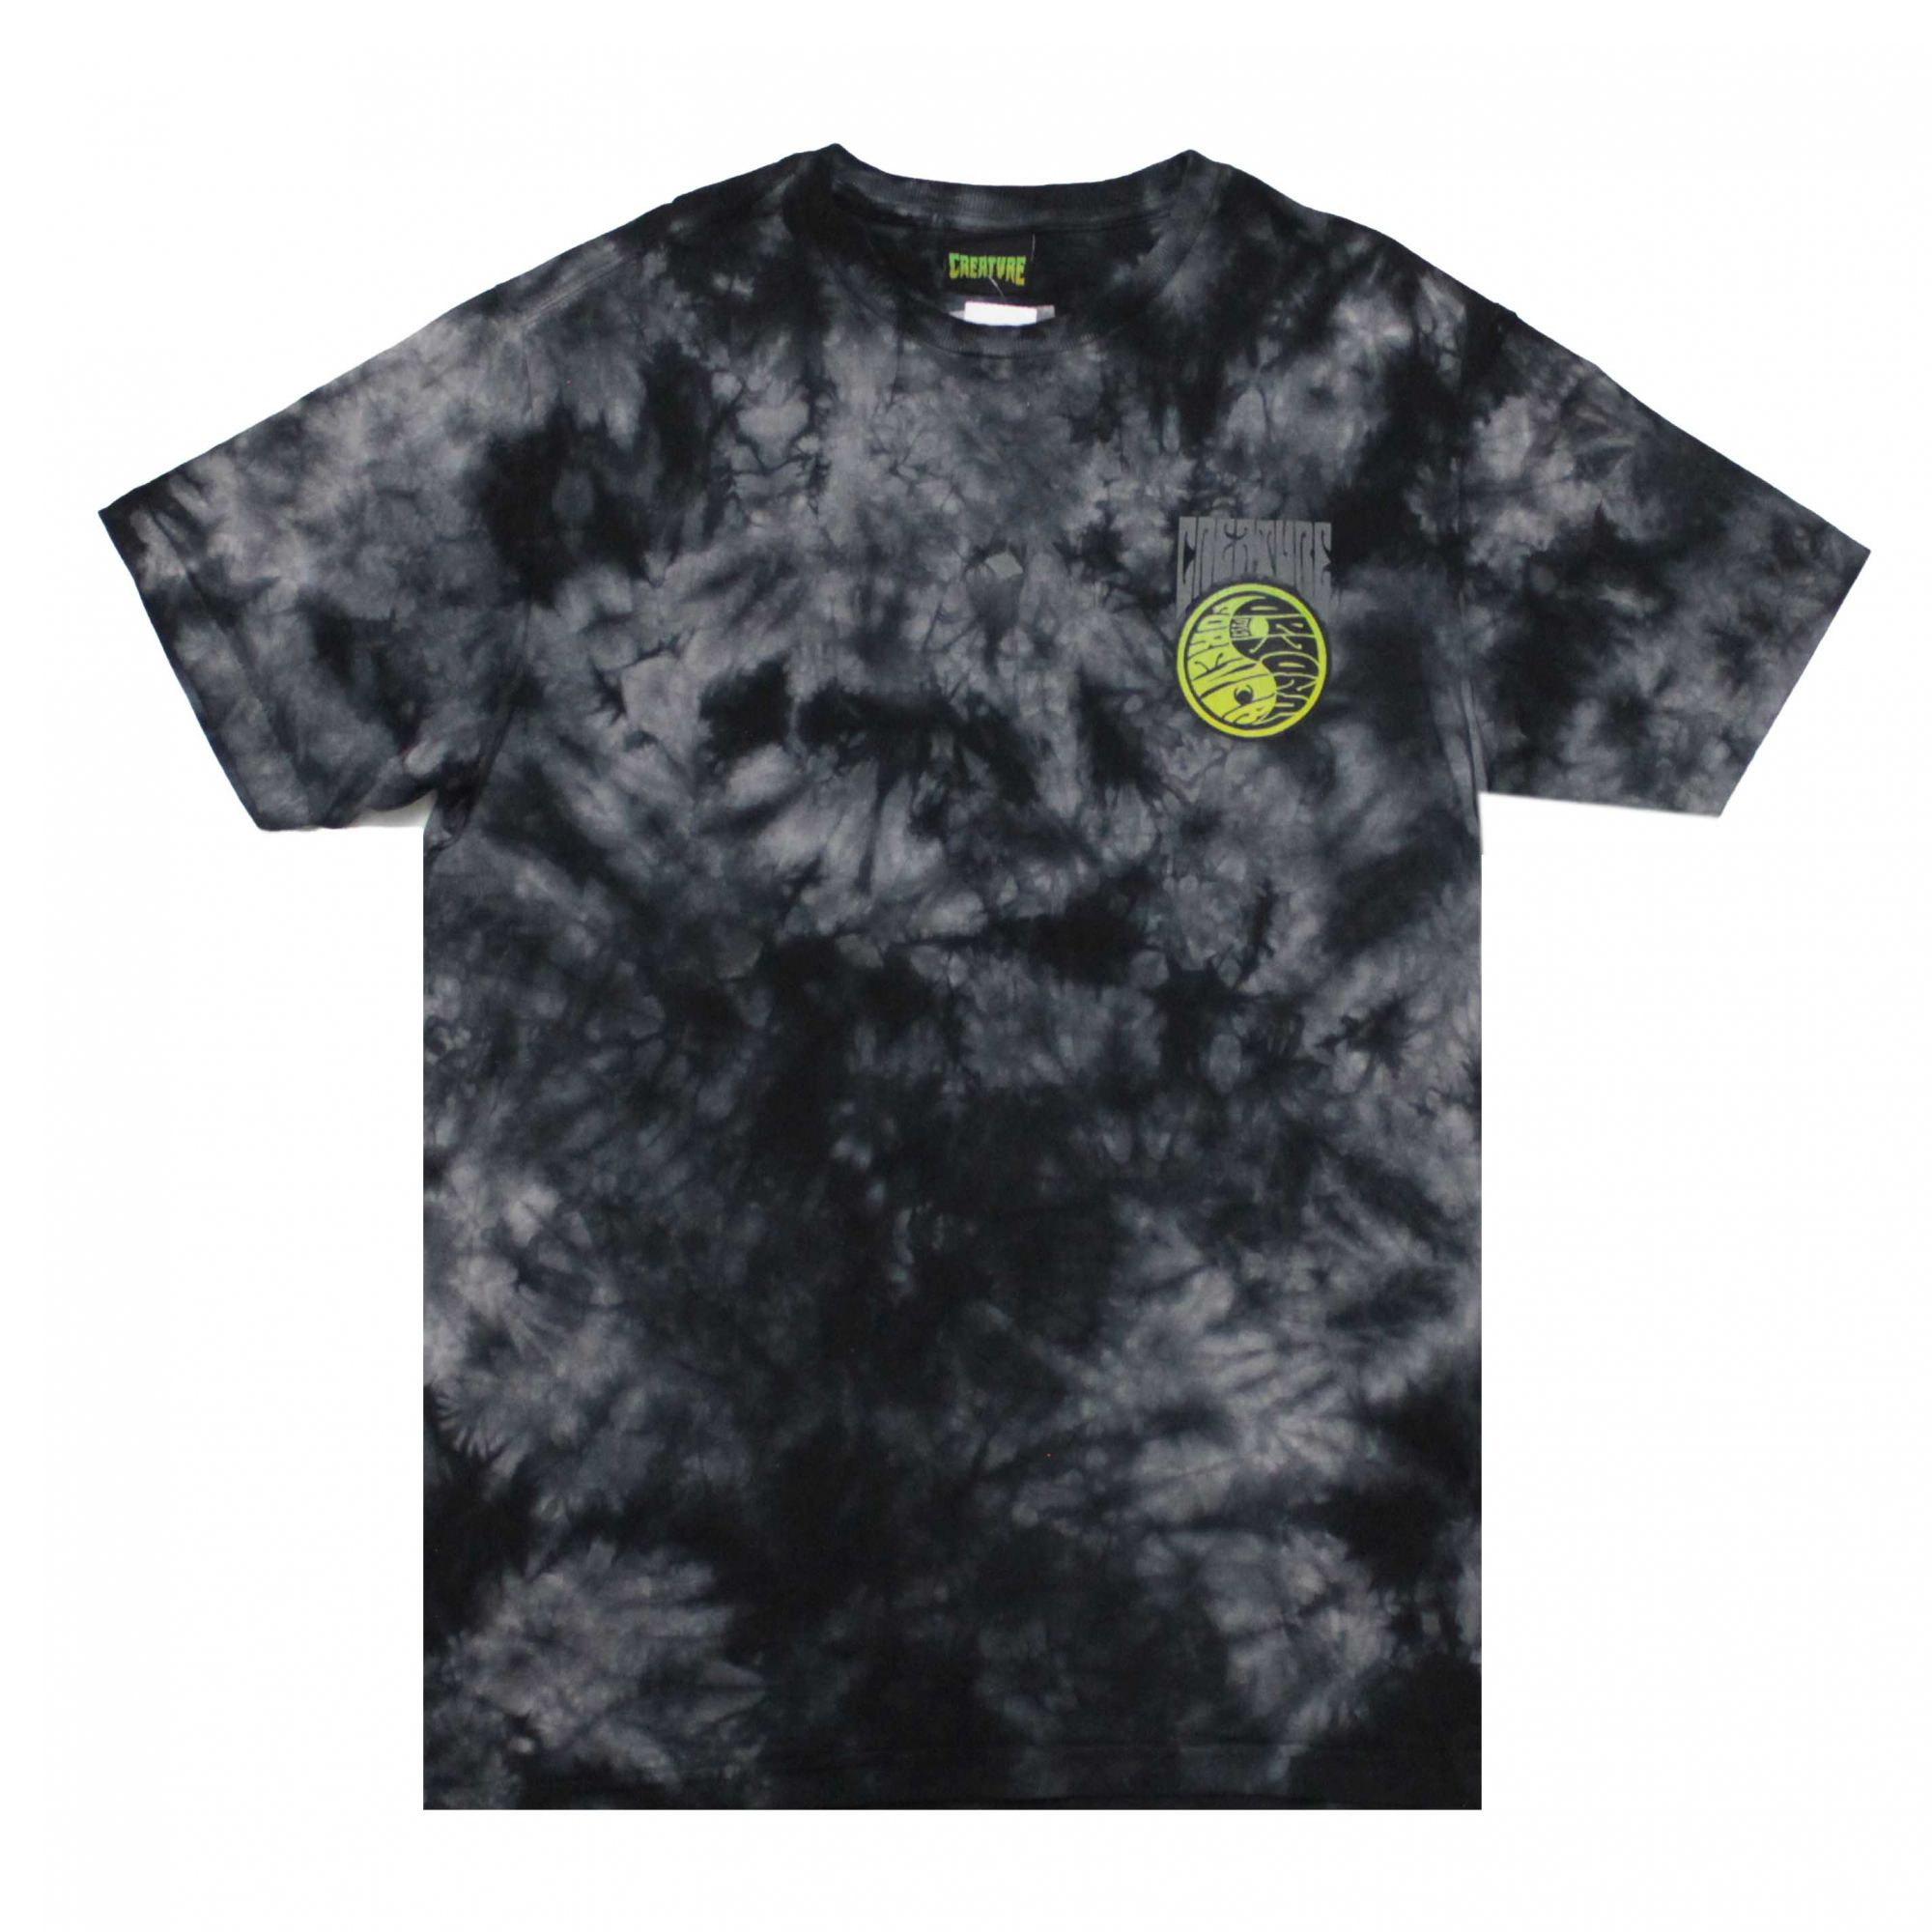 Camiseta Creature Yanger Tie Dye Preto